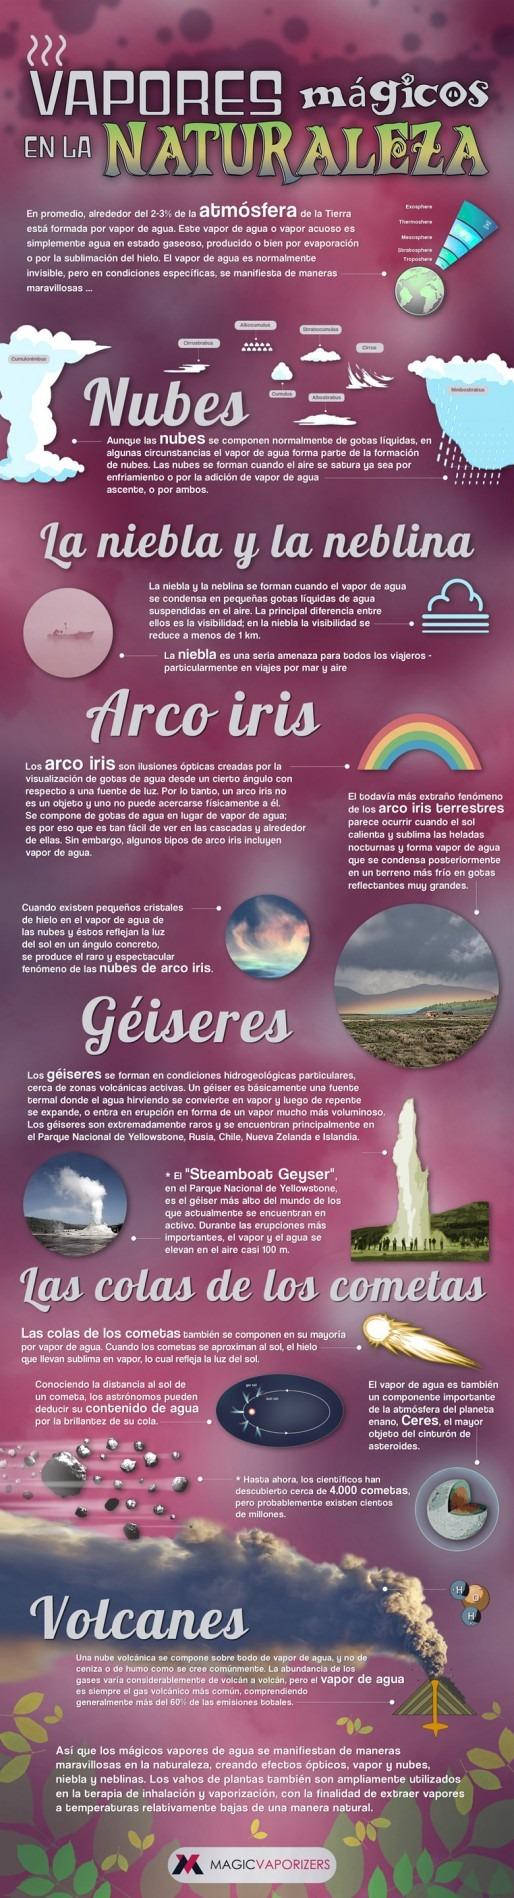 Vaporisers in Nature infographic in Spanish